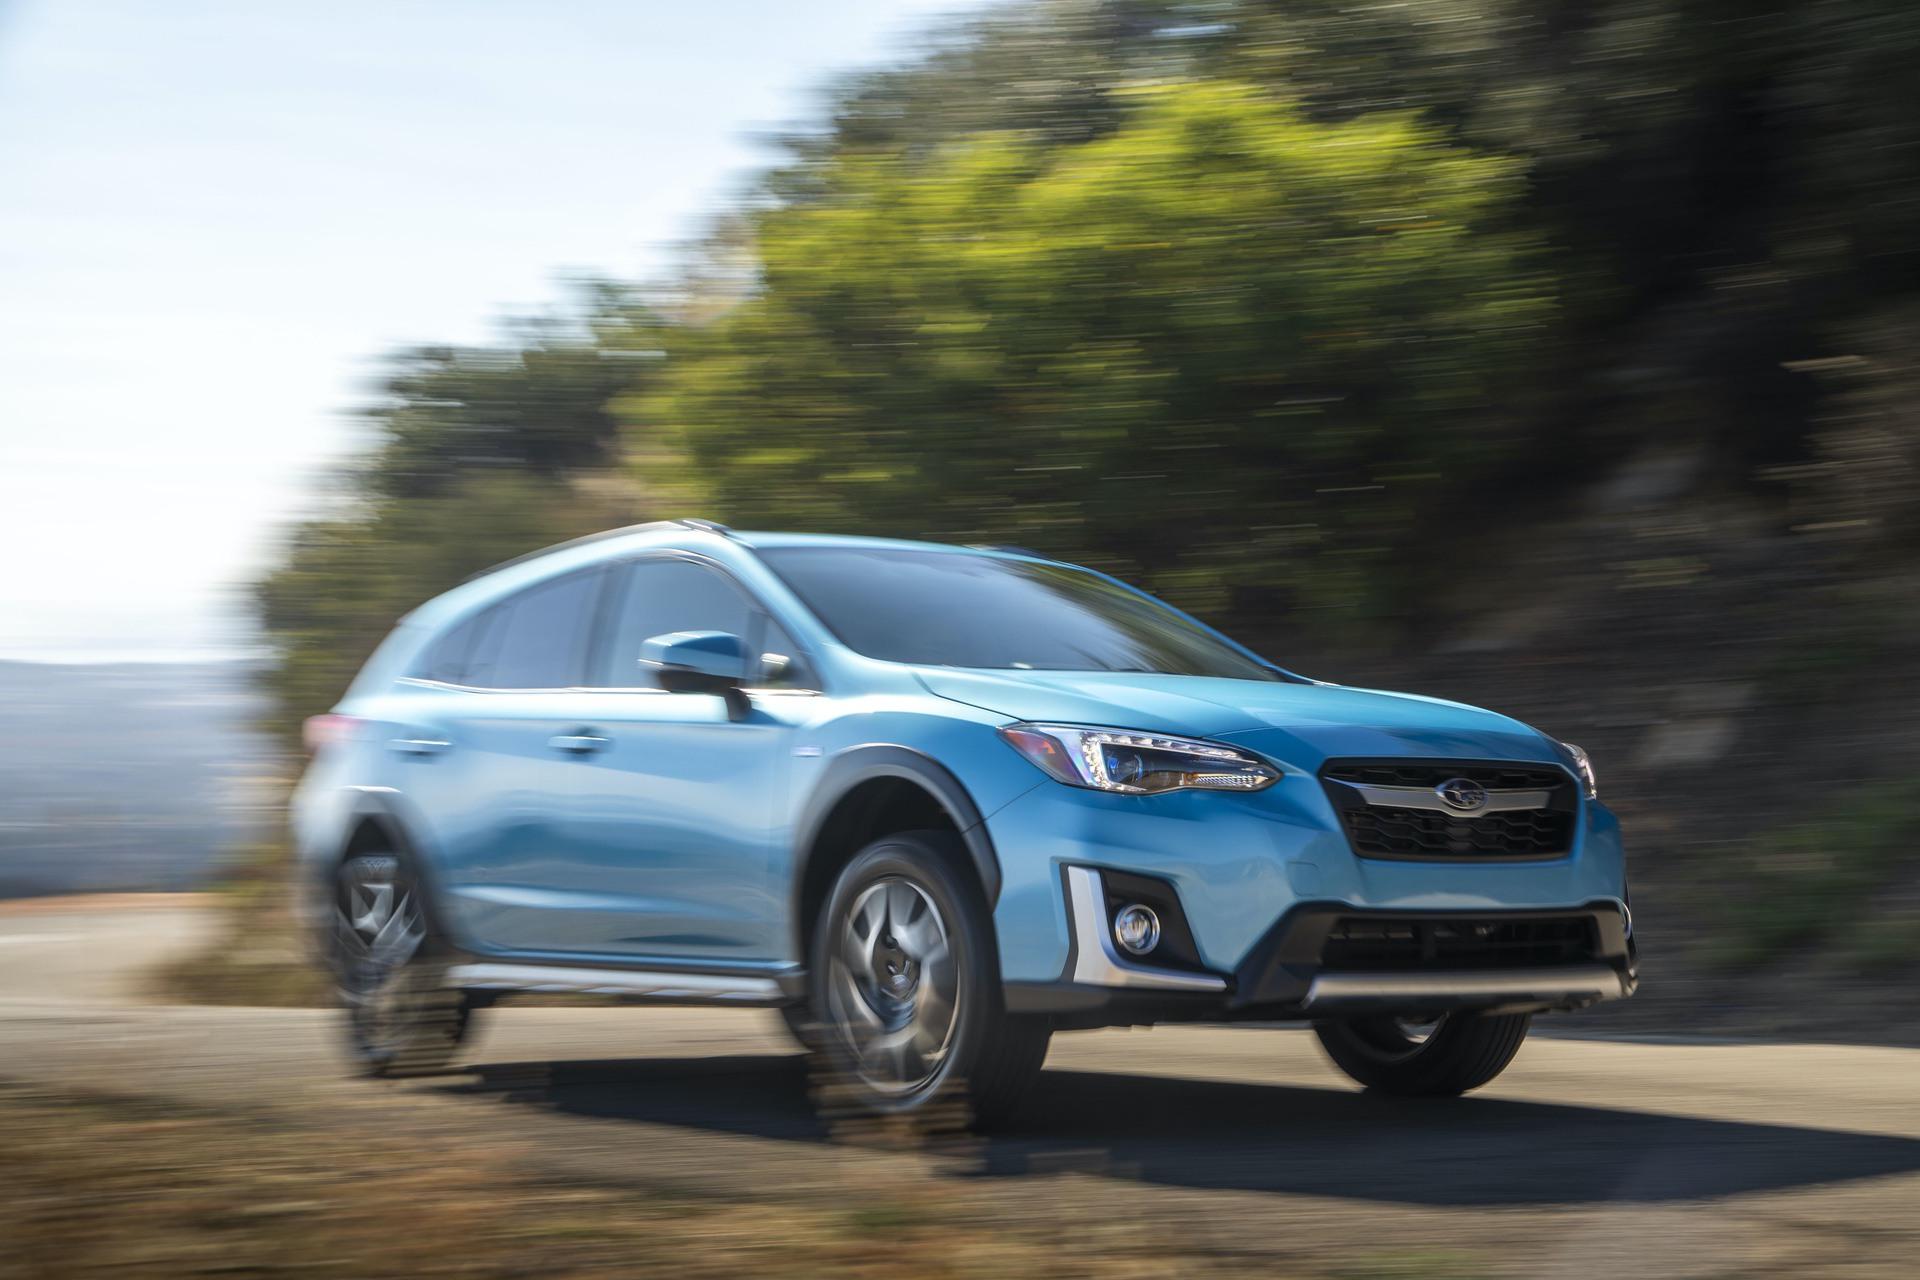 2019_Subaru_XV_Hybrid_0027